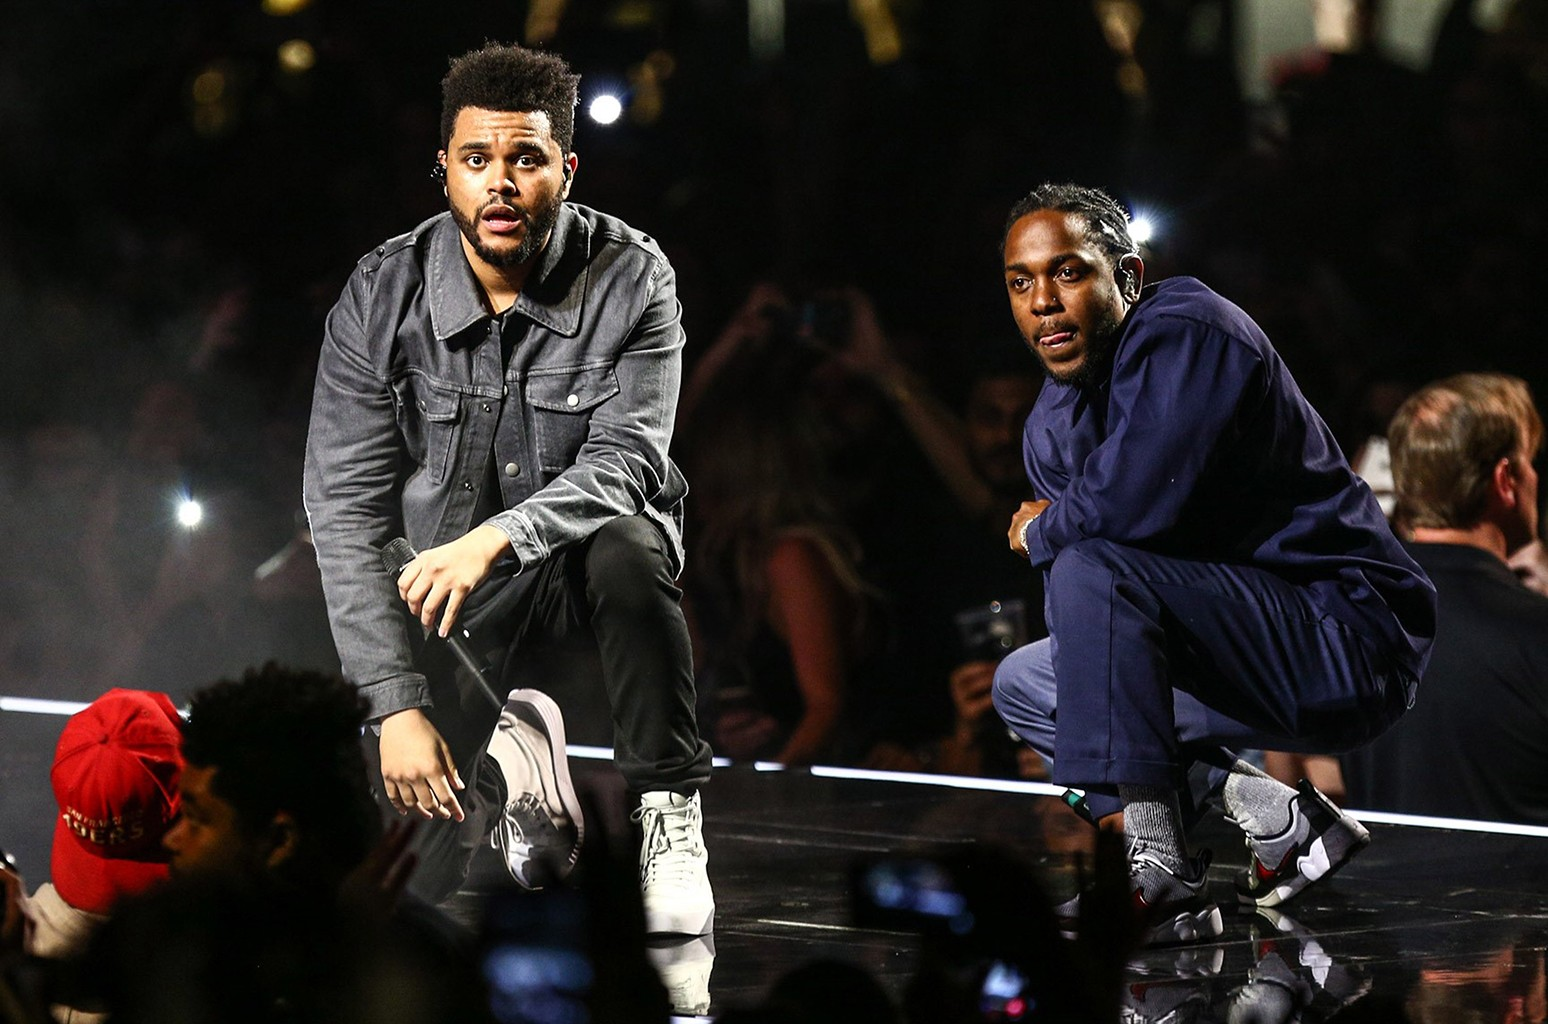 Kendrick Lamar & The Weeknd